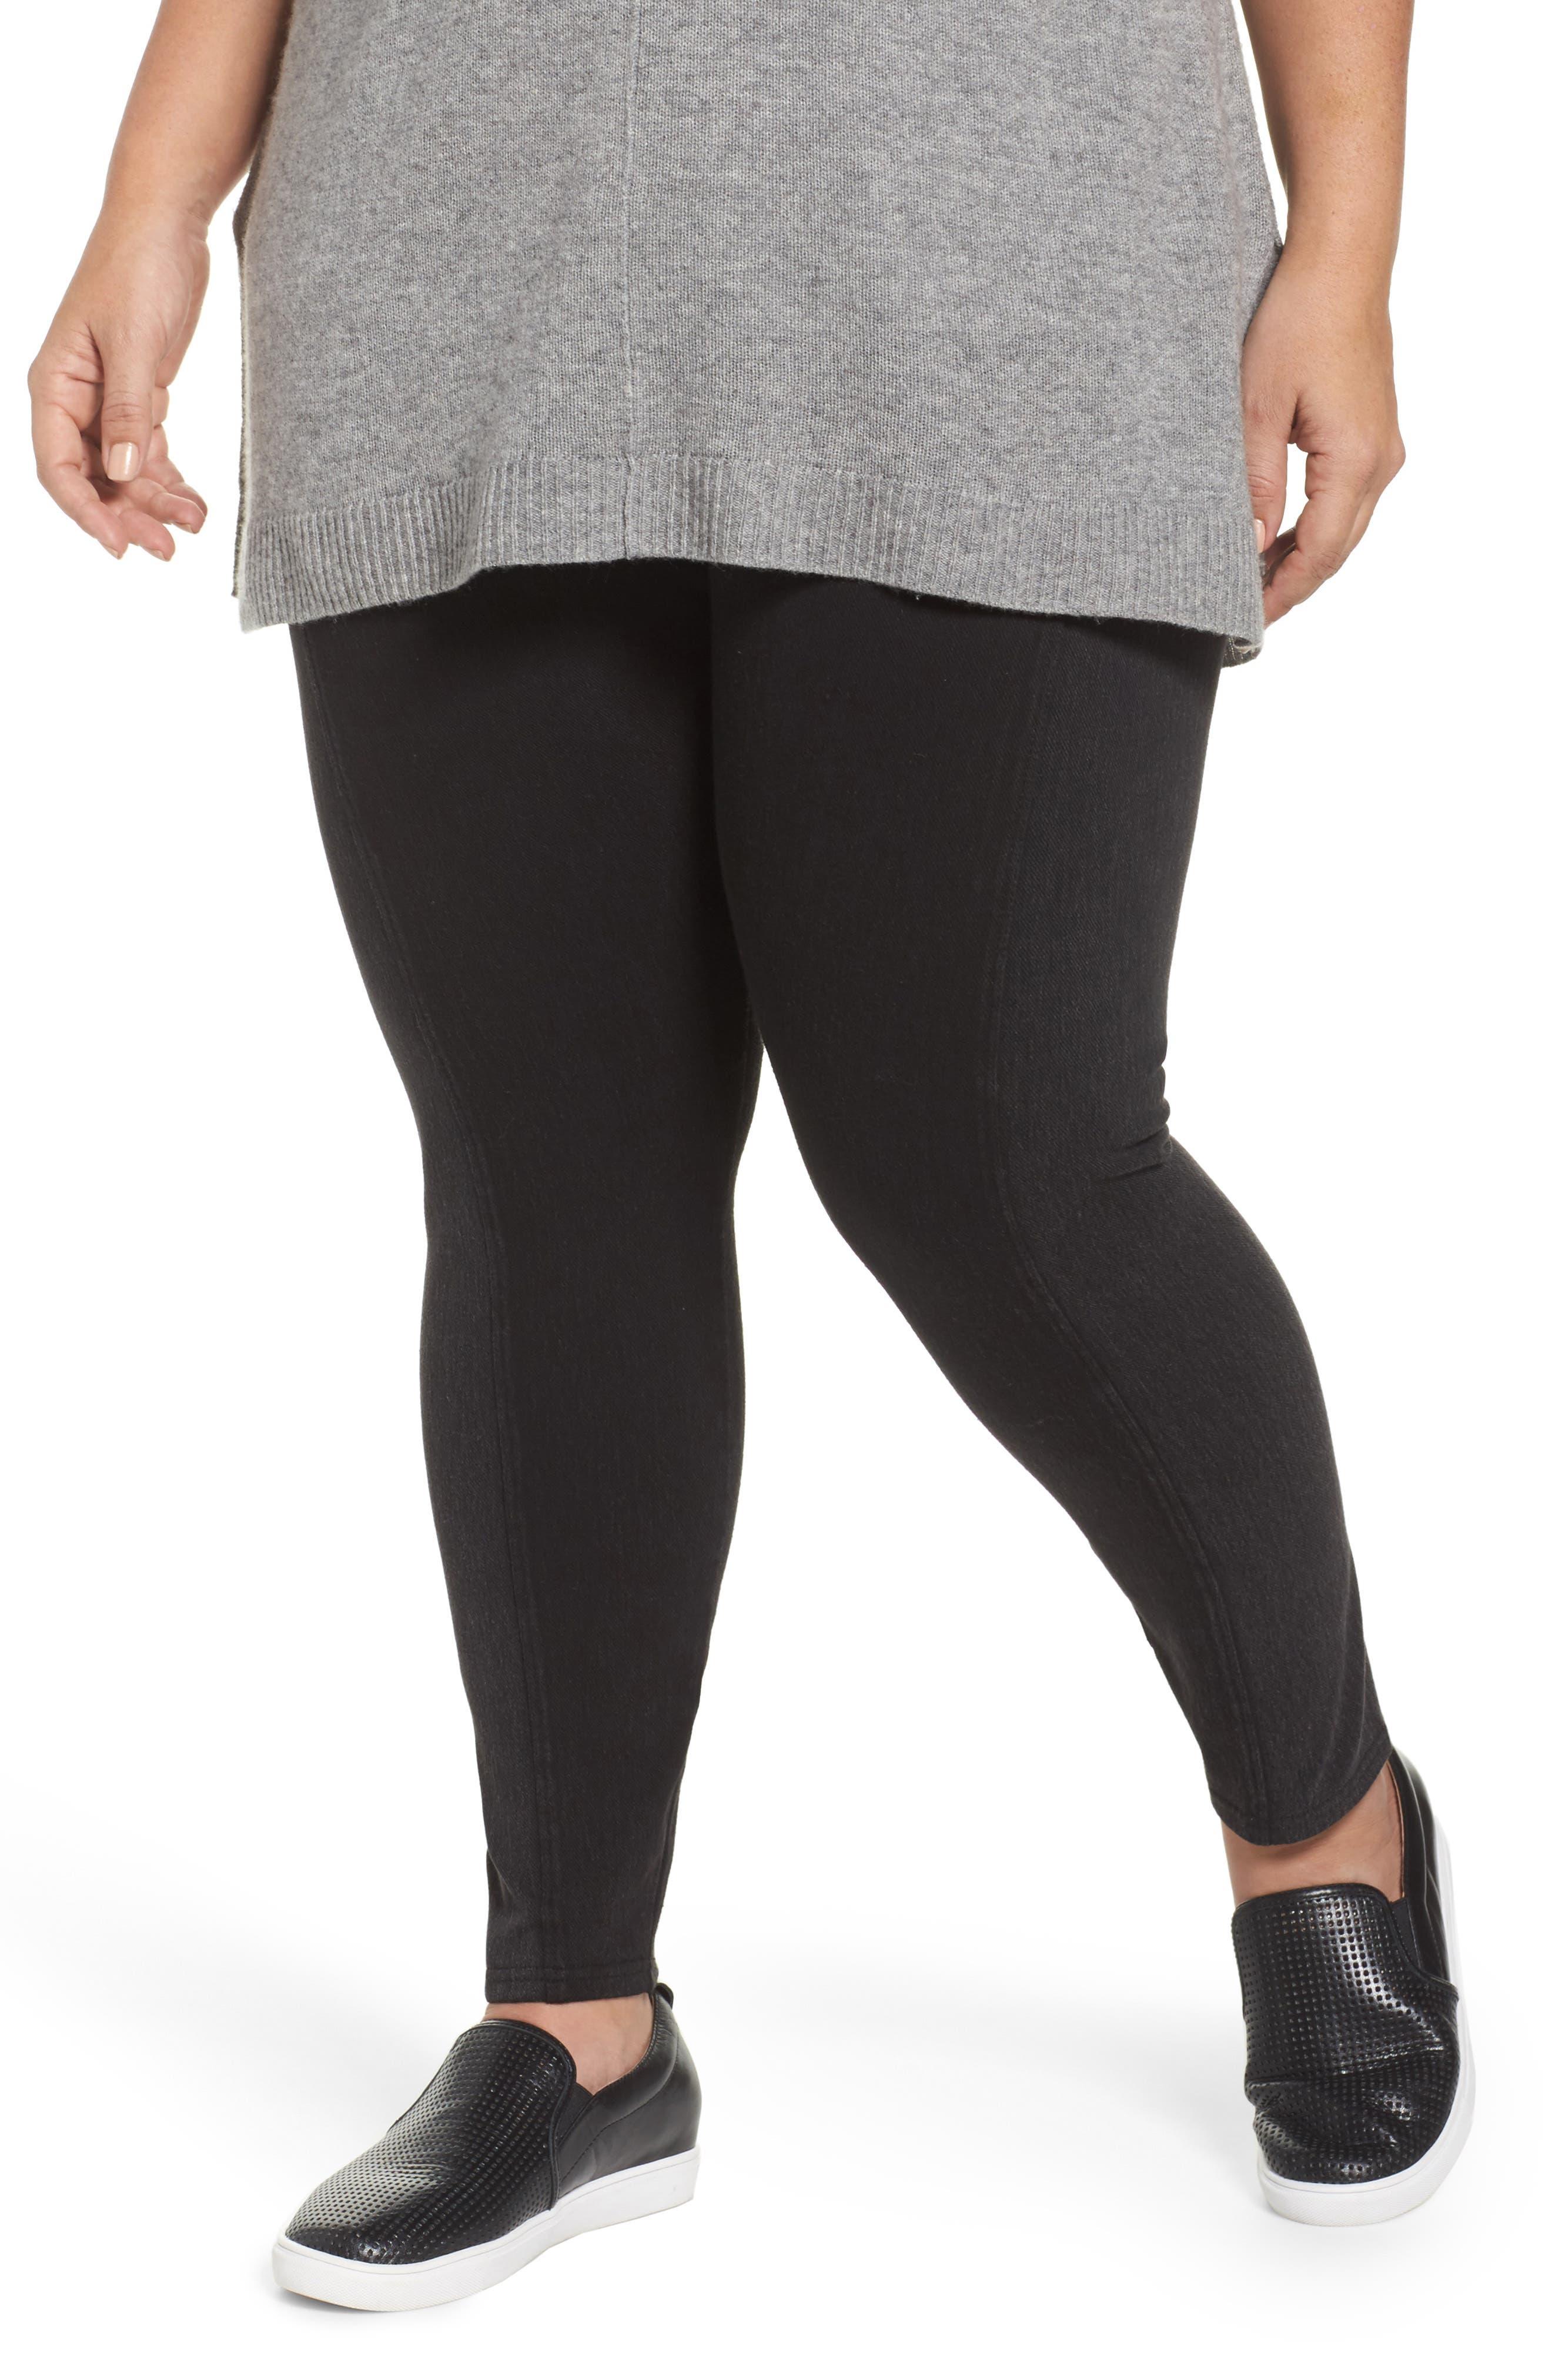 Lyssé Marley Denim Leggings (Plus Size)